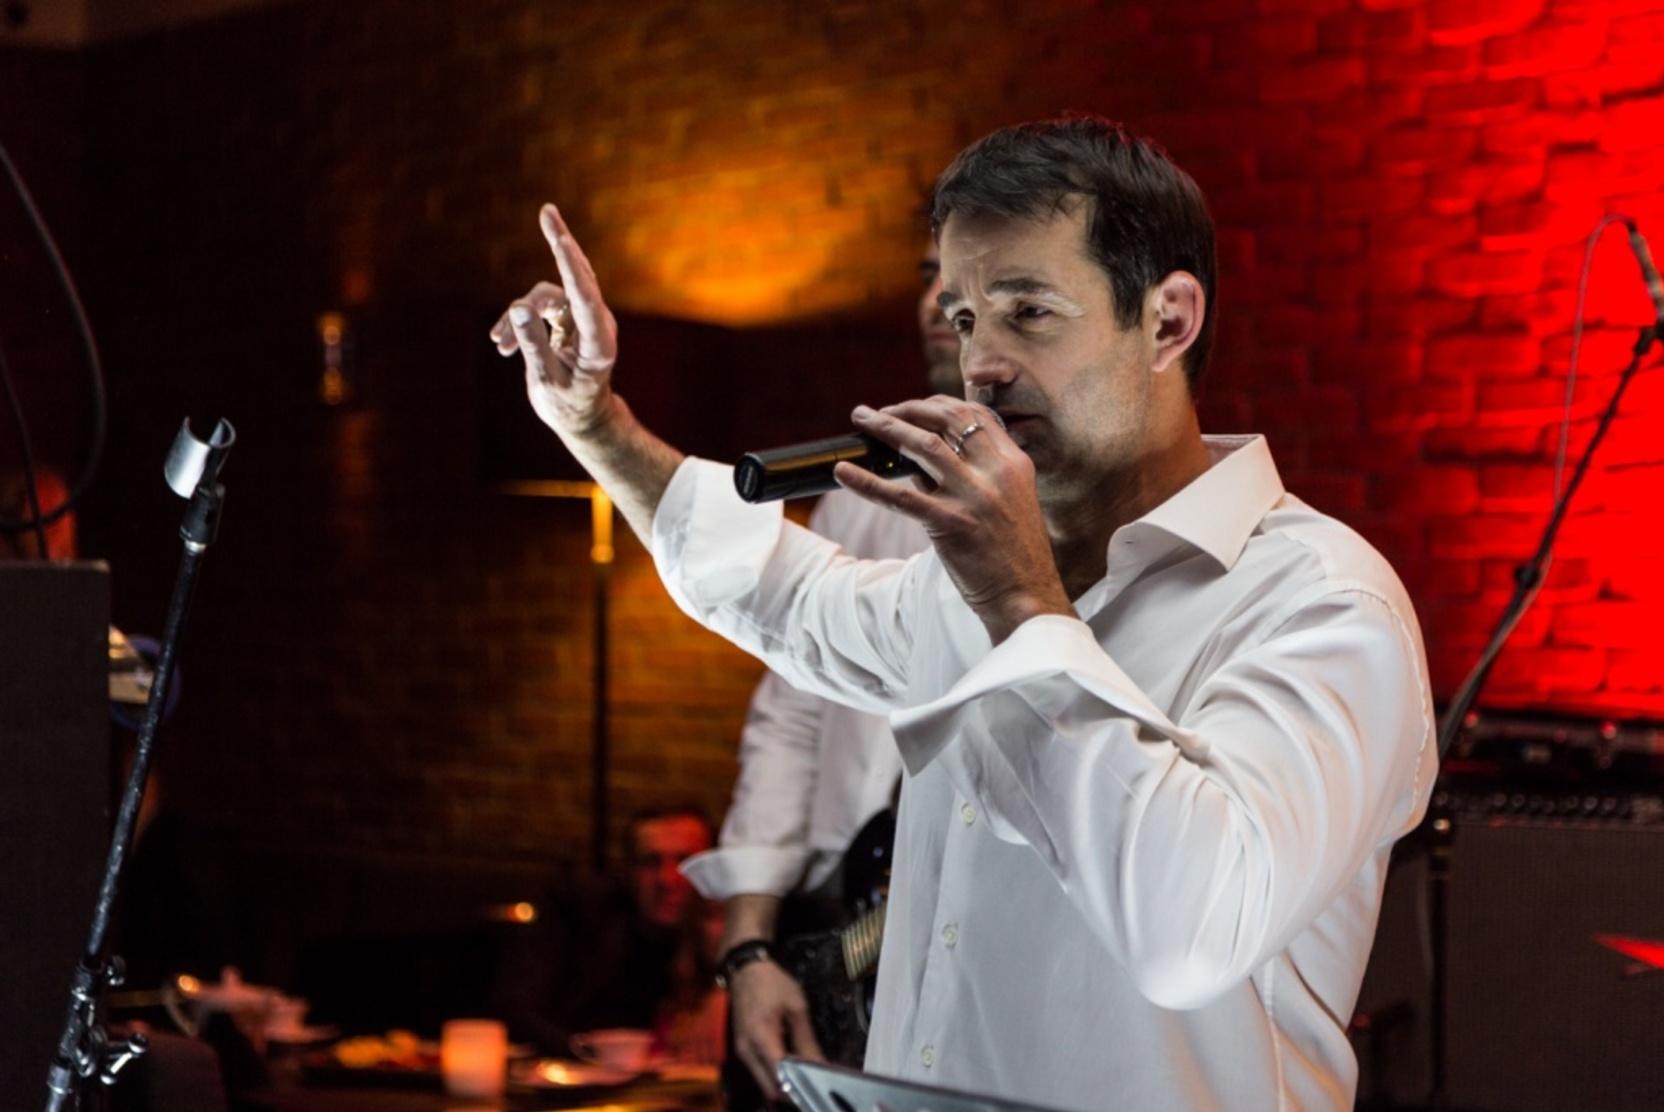 Актер Дмитрий Певцов собрался в Госдуму